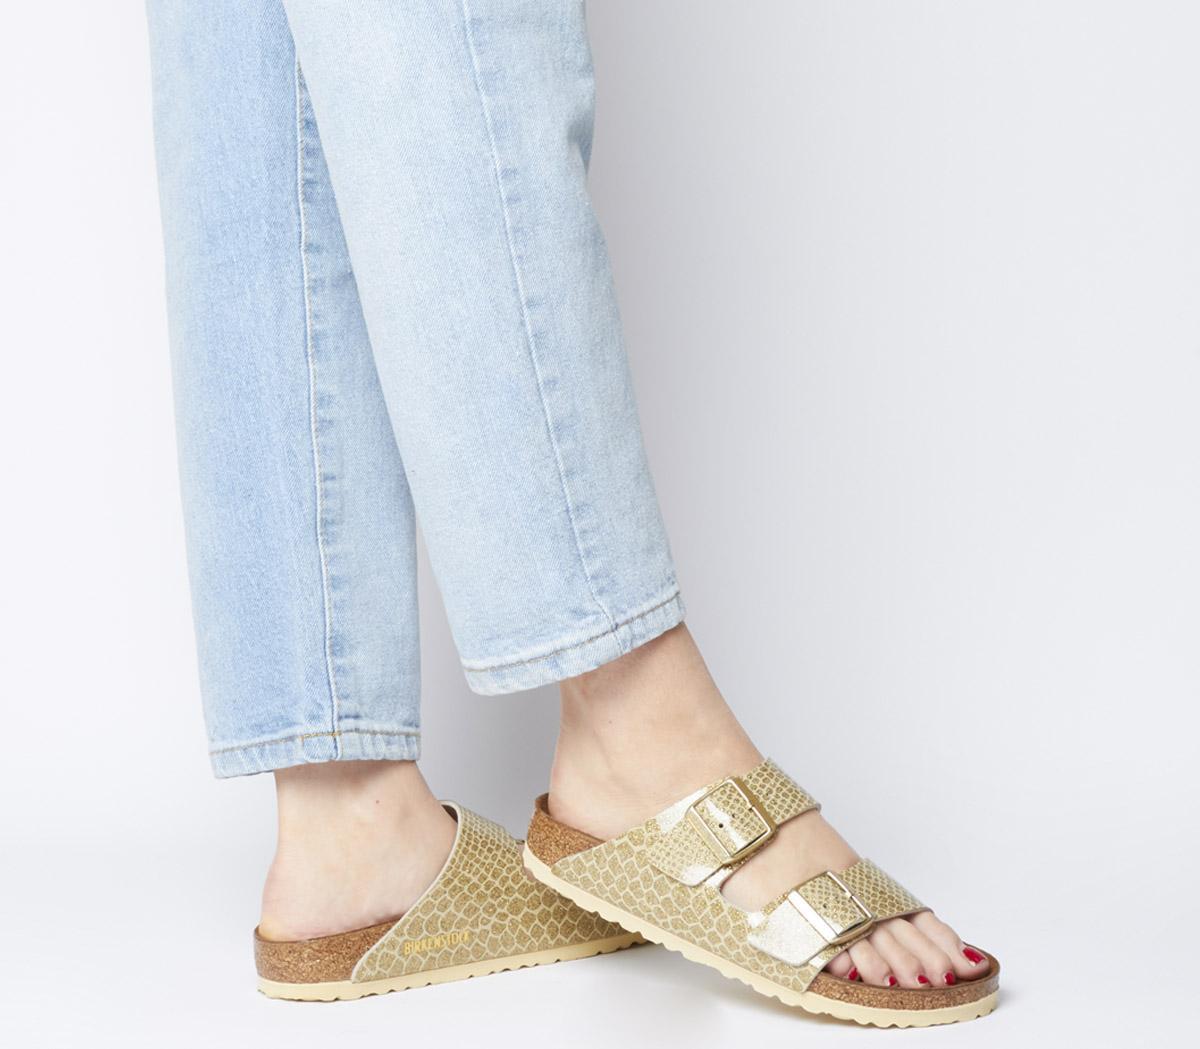 Birkenstock Arizona Two Strap Sandals Magic Snake Gold Sandals